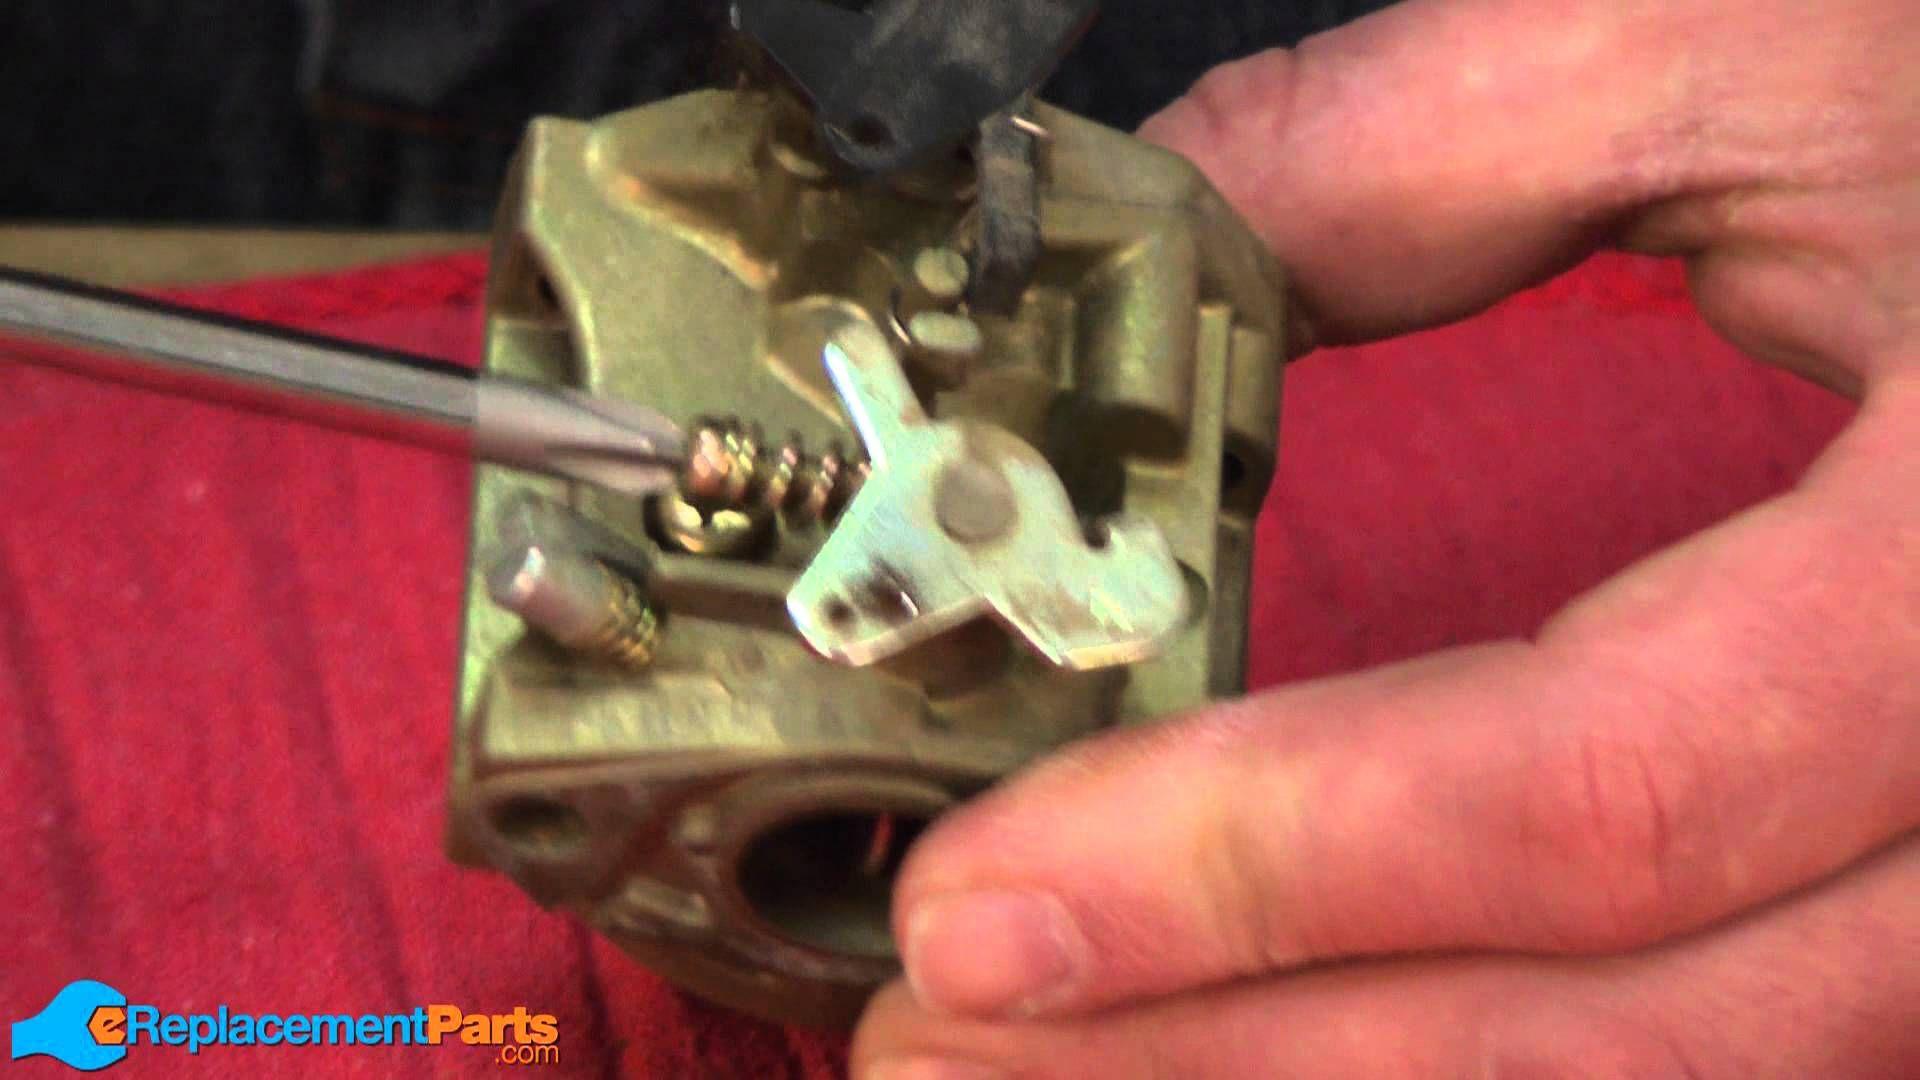 How To Fix A Lawn Mower Carburetor Honey Do List Lawn